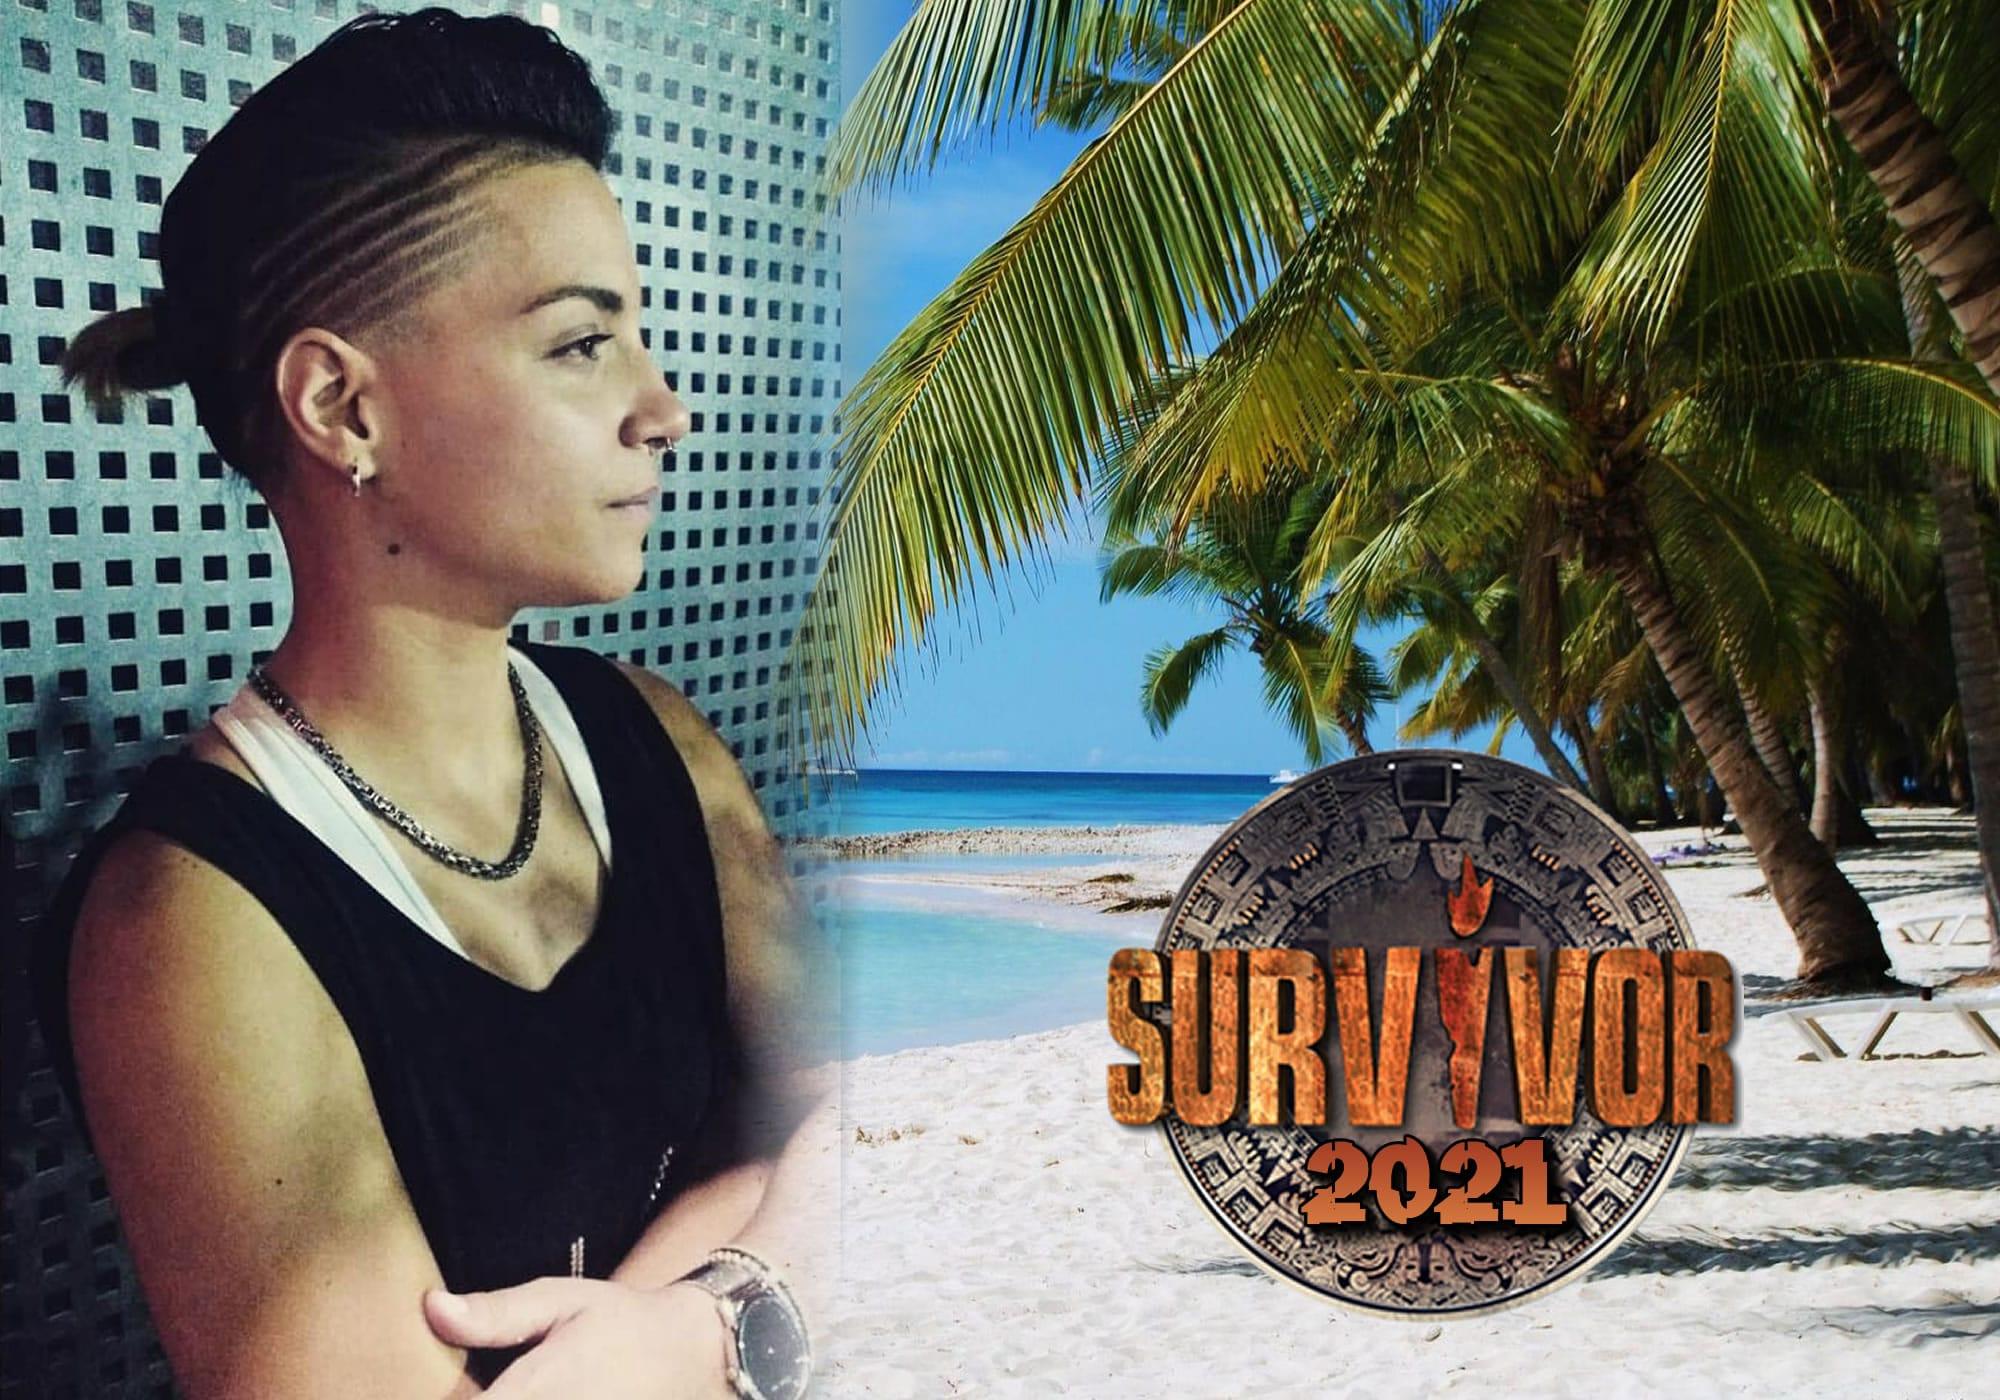 Survivor spoiler: Ποια είναι η νέα παίκτρια Μαντώ Βουρλιώτη